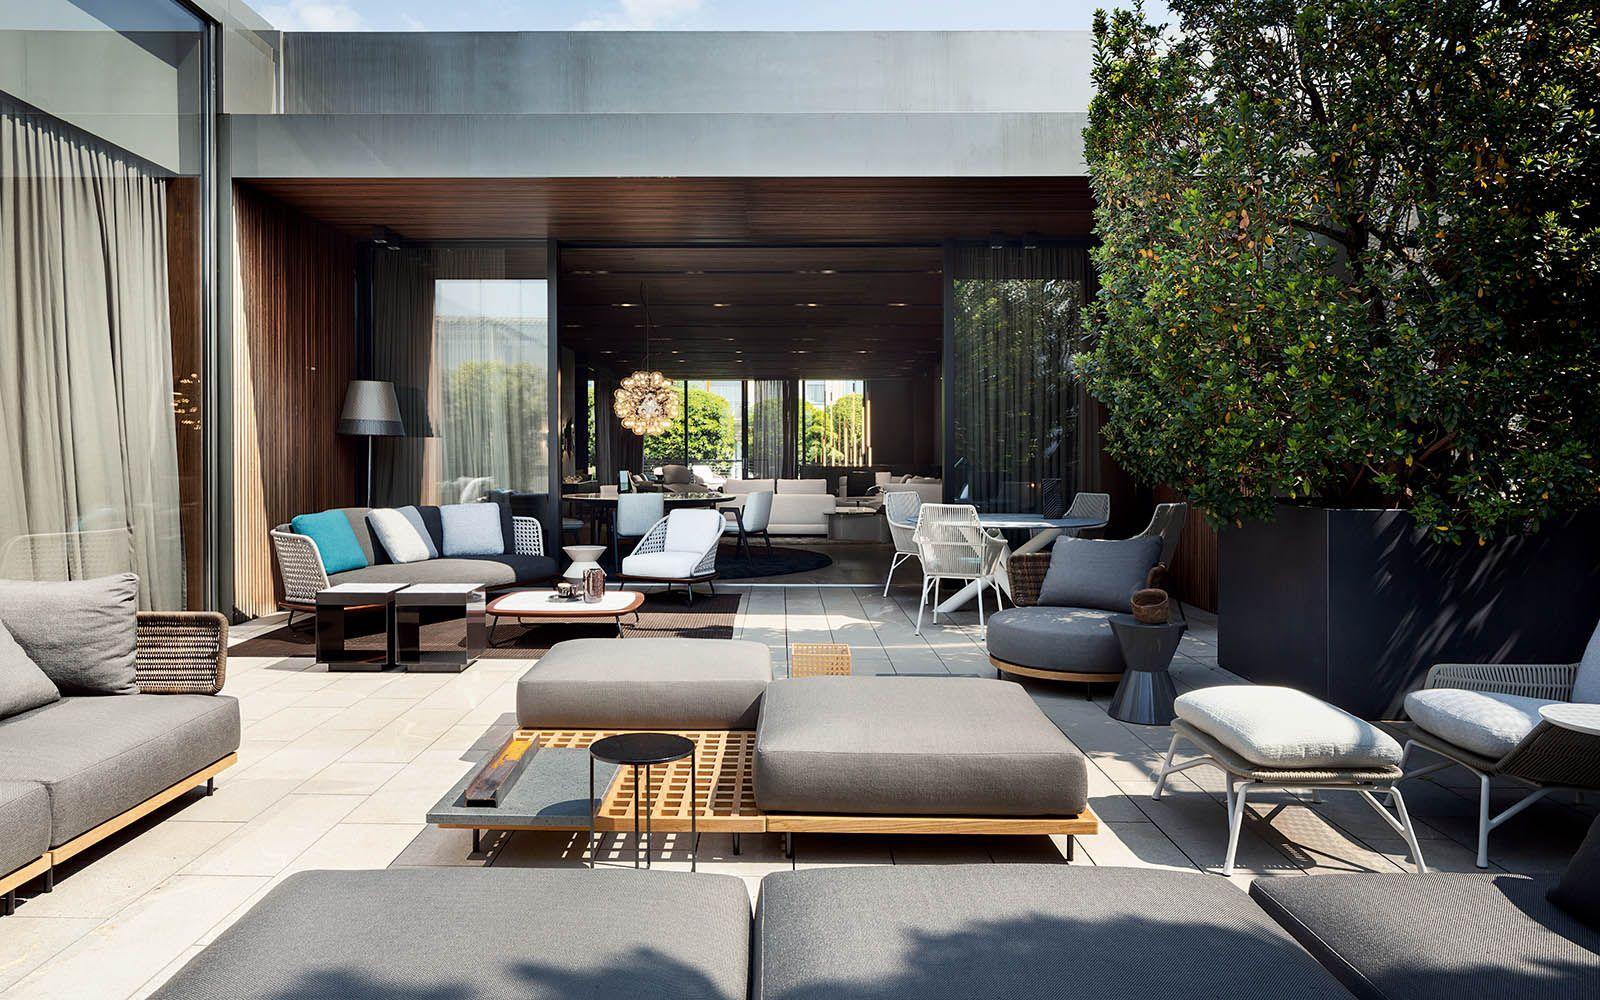 Quadrado outdoor seating system marcio kogan studio mk27 design minotti70 marciokogan outdoor 2018collection madeinitaly